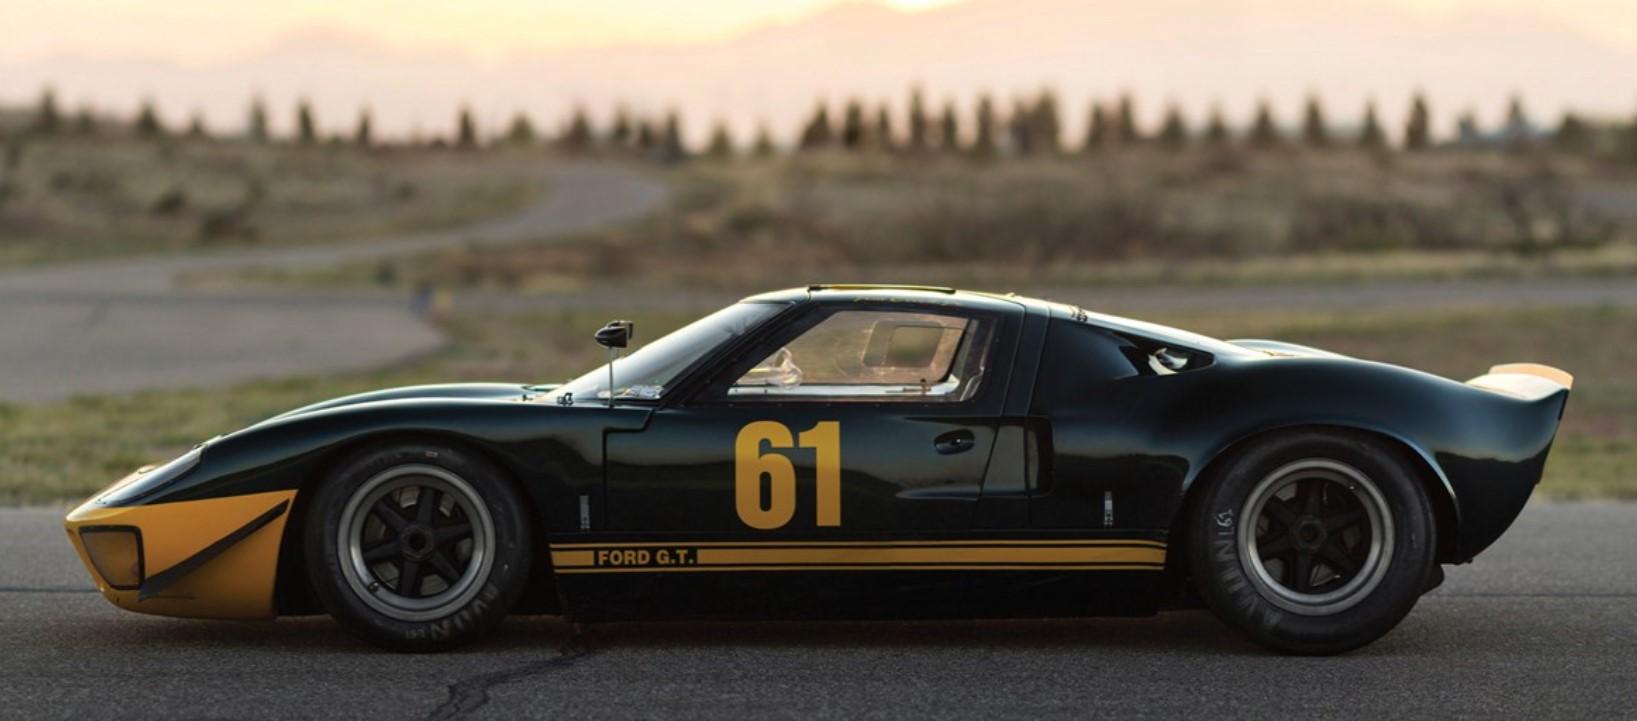 GT401.jpg